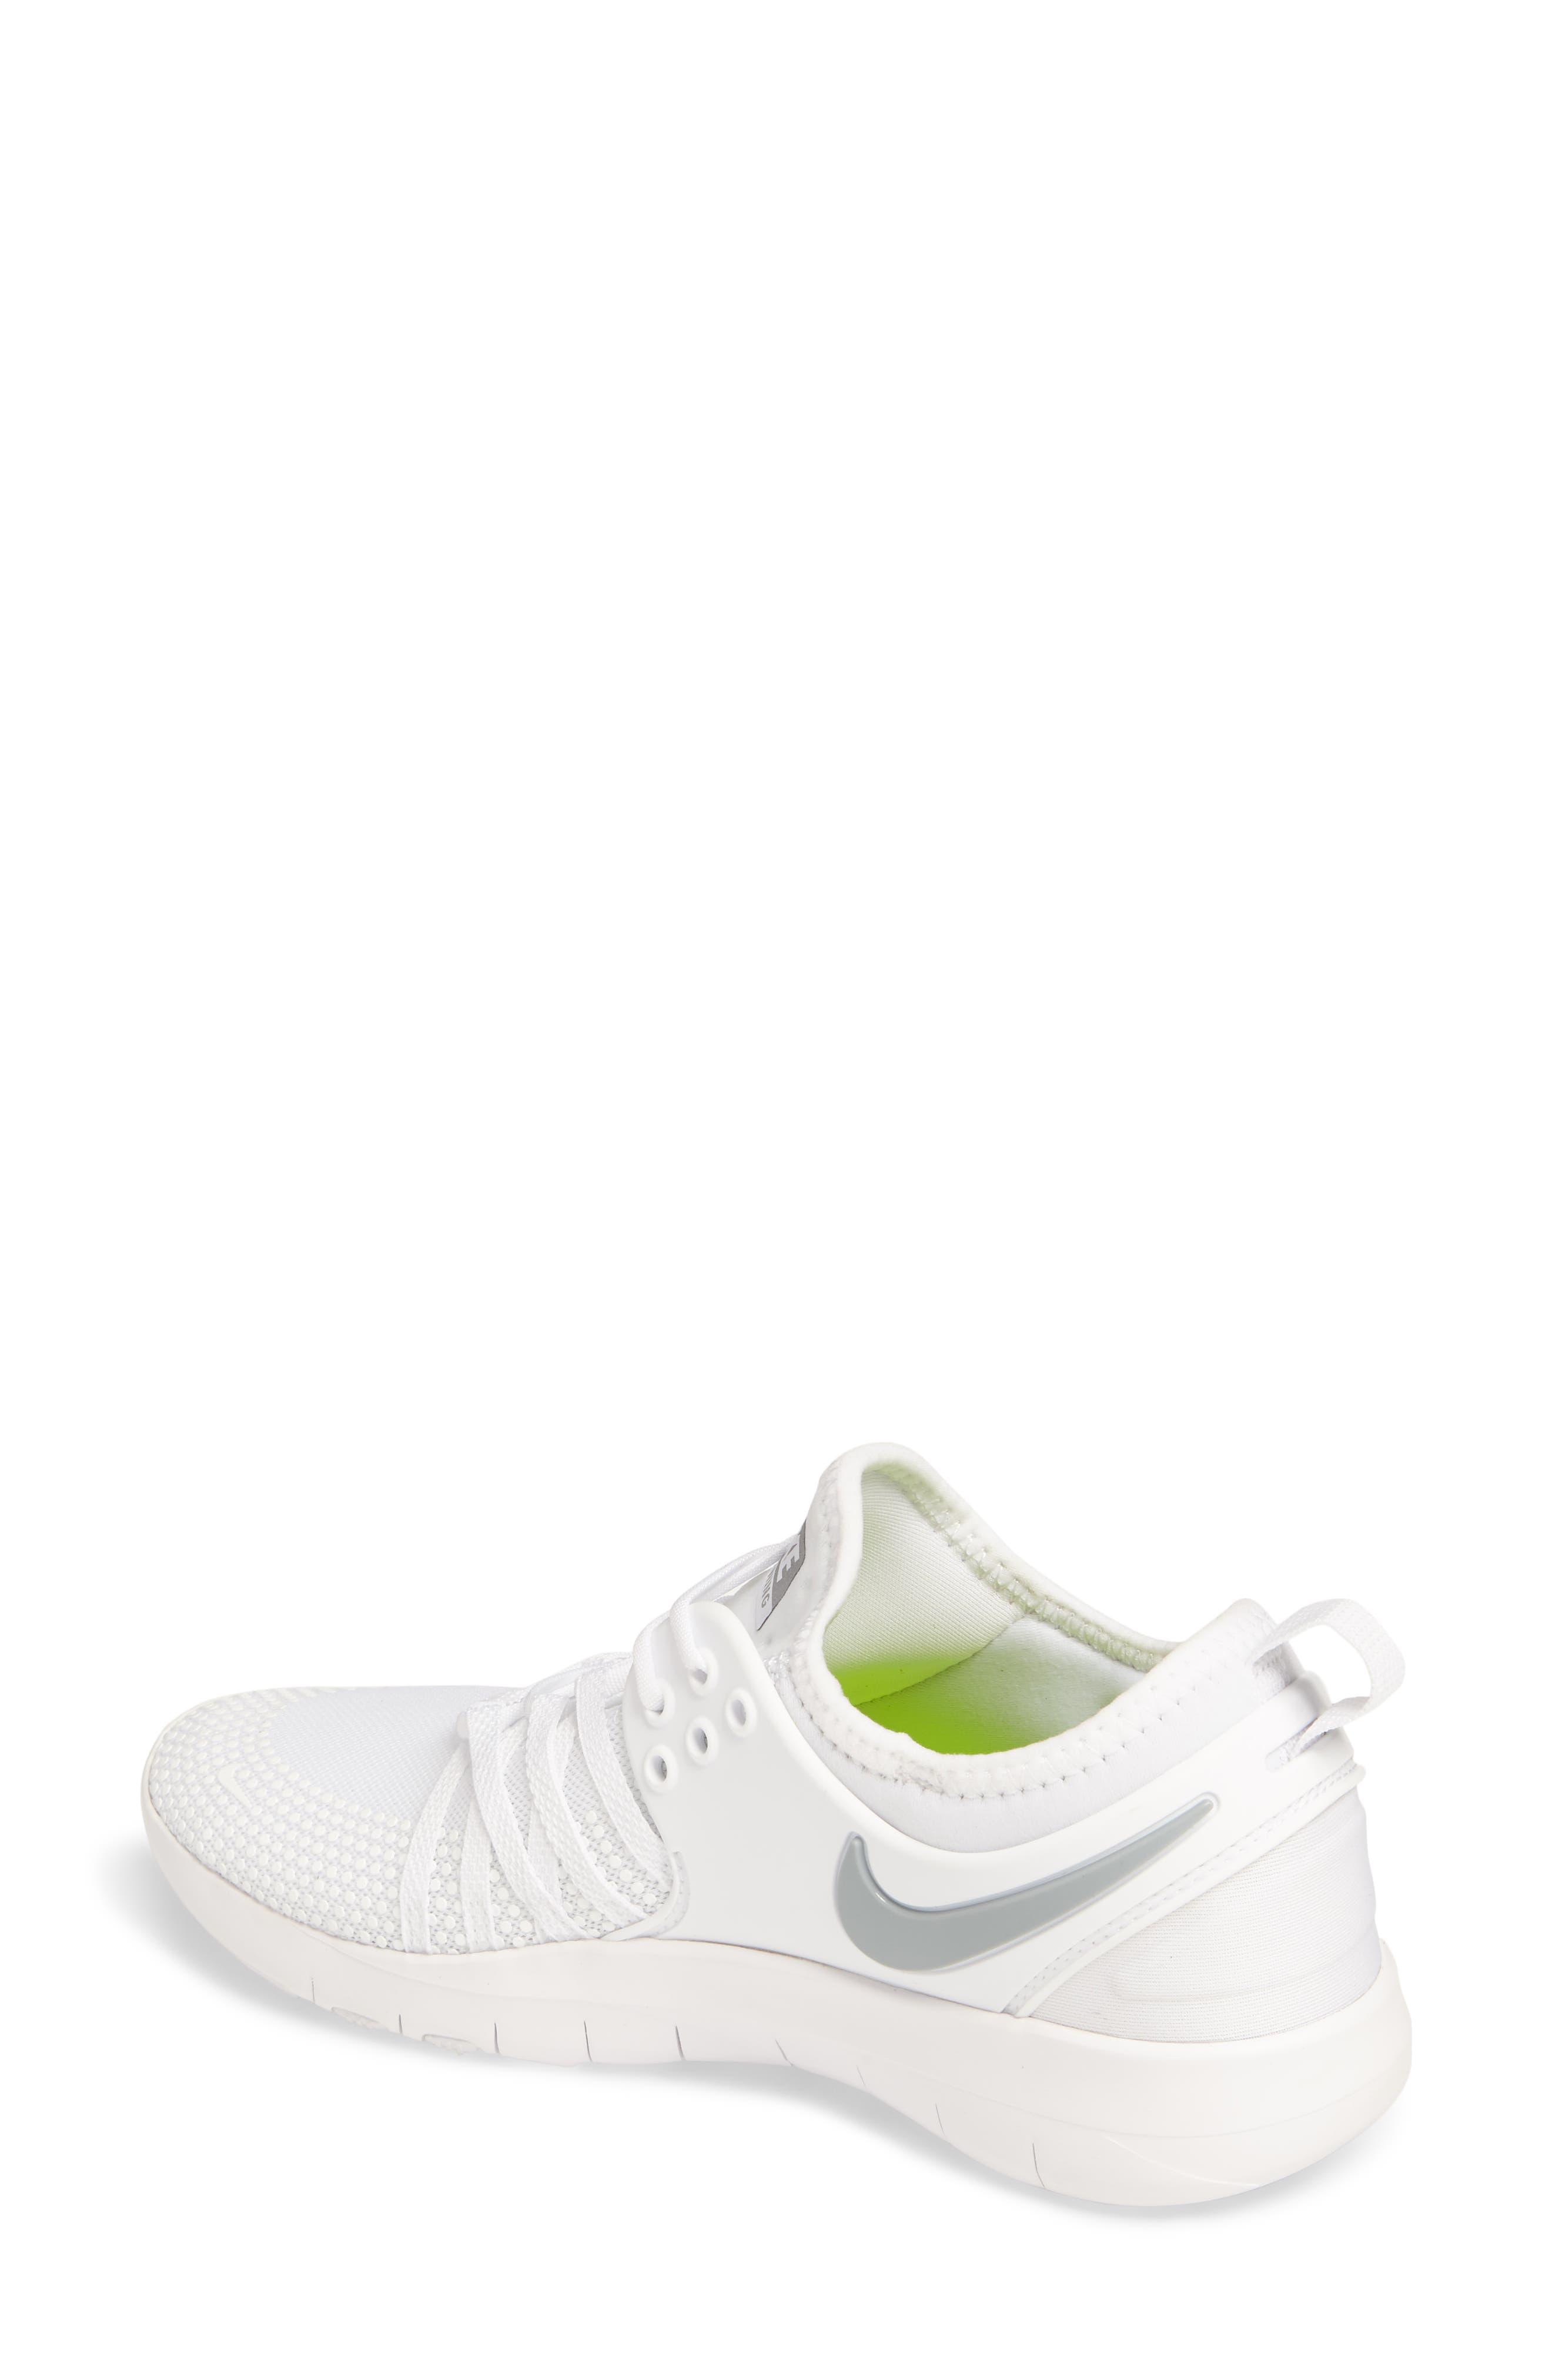 Free TR 7 Training Shoe,                             Alternate thumbnail 2, color,                             White/ Metallic Silver